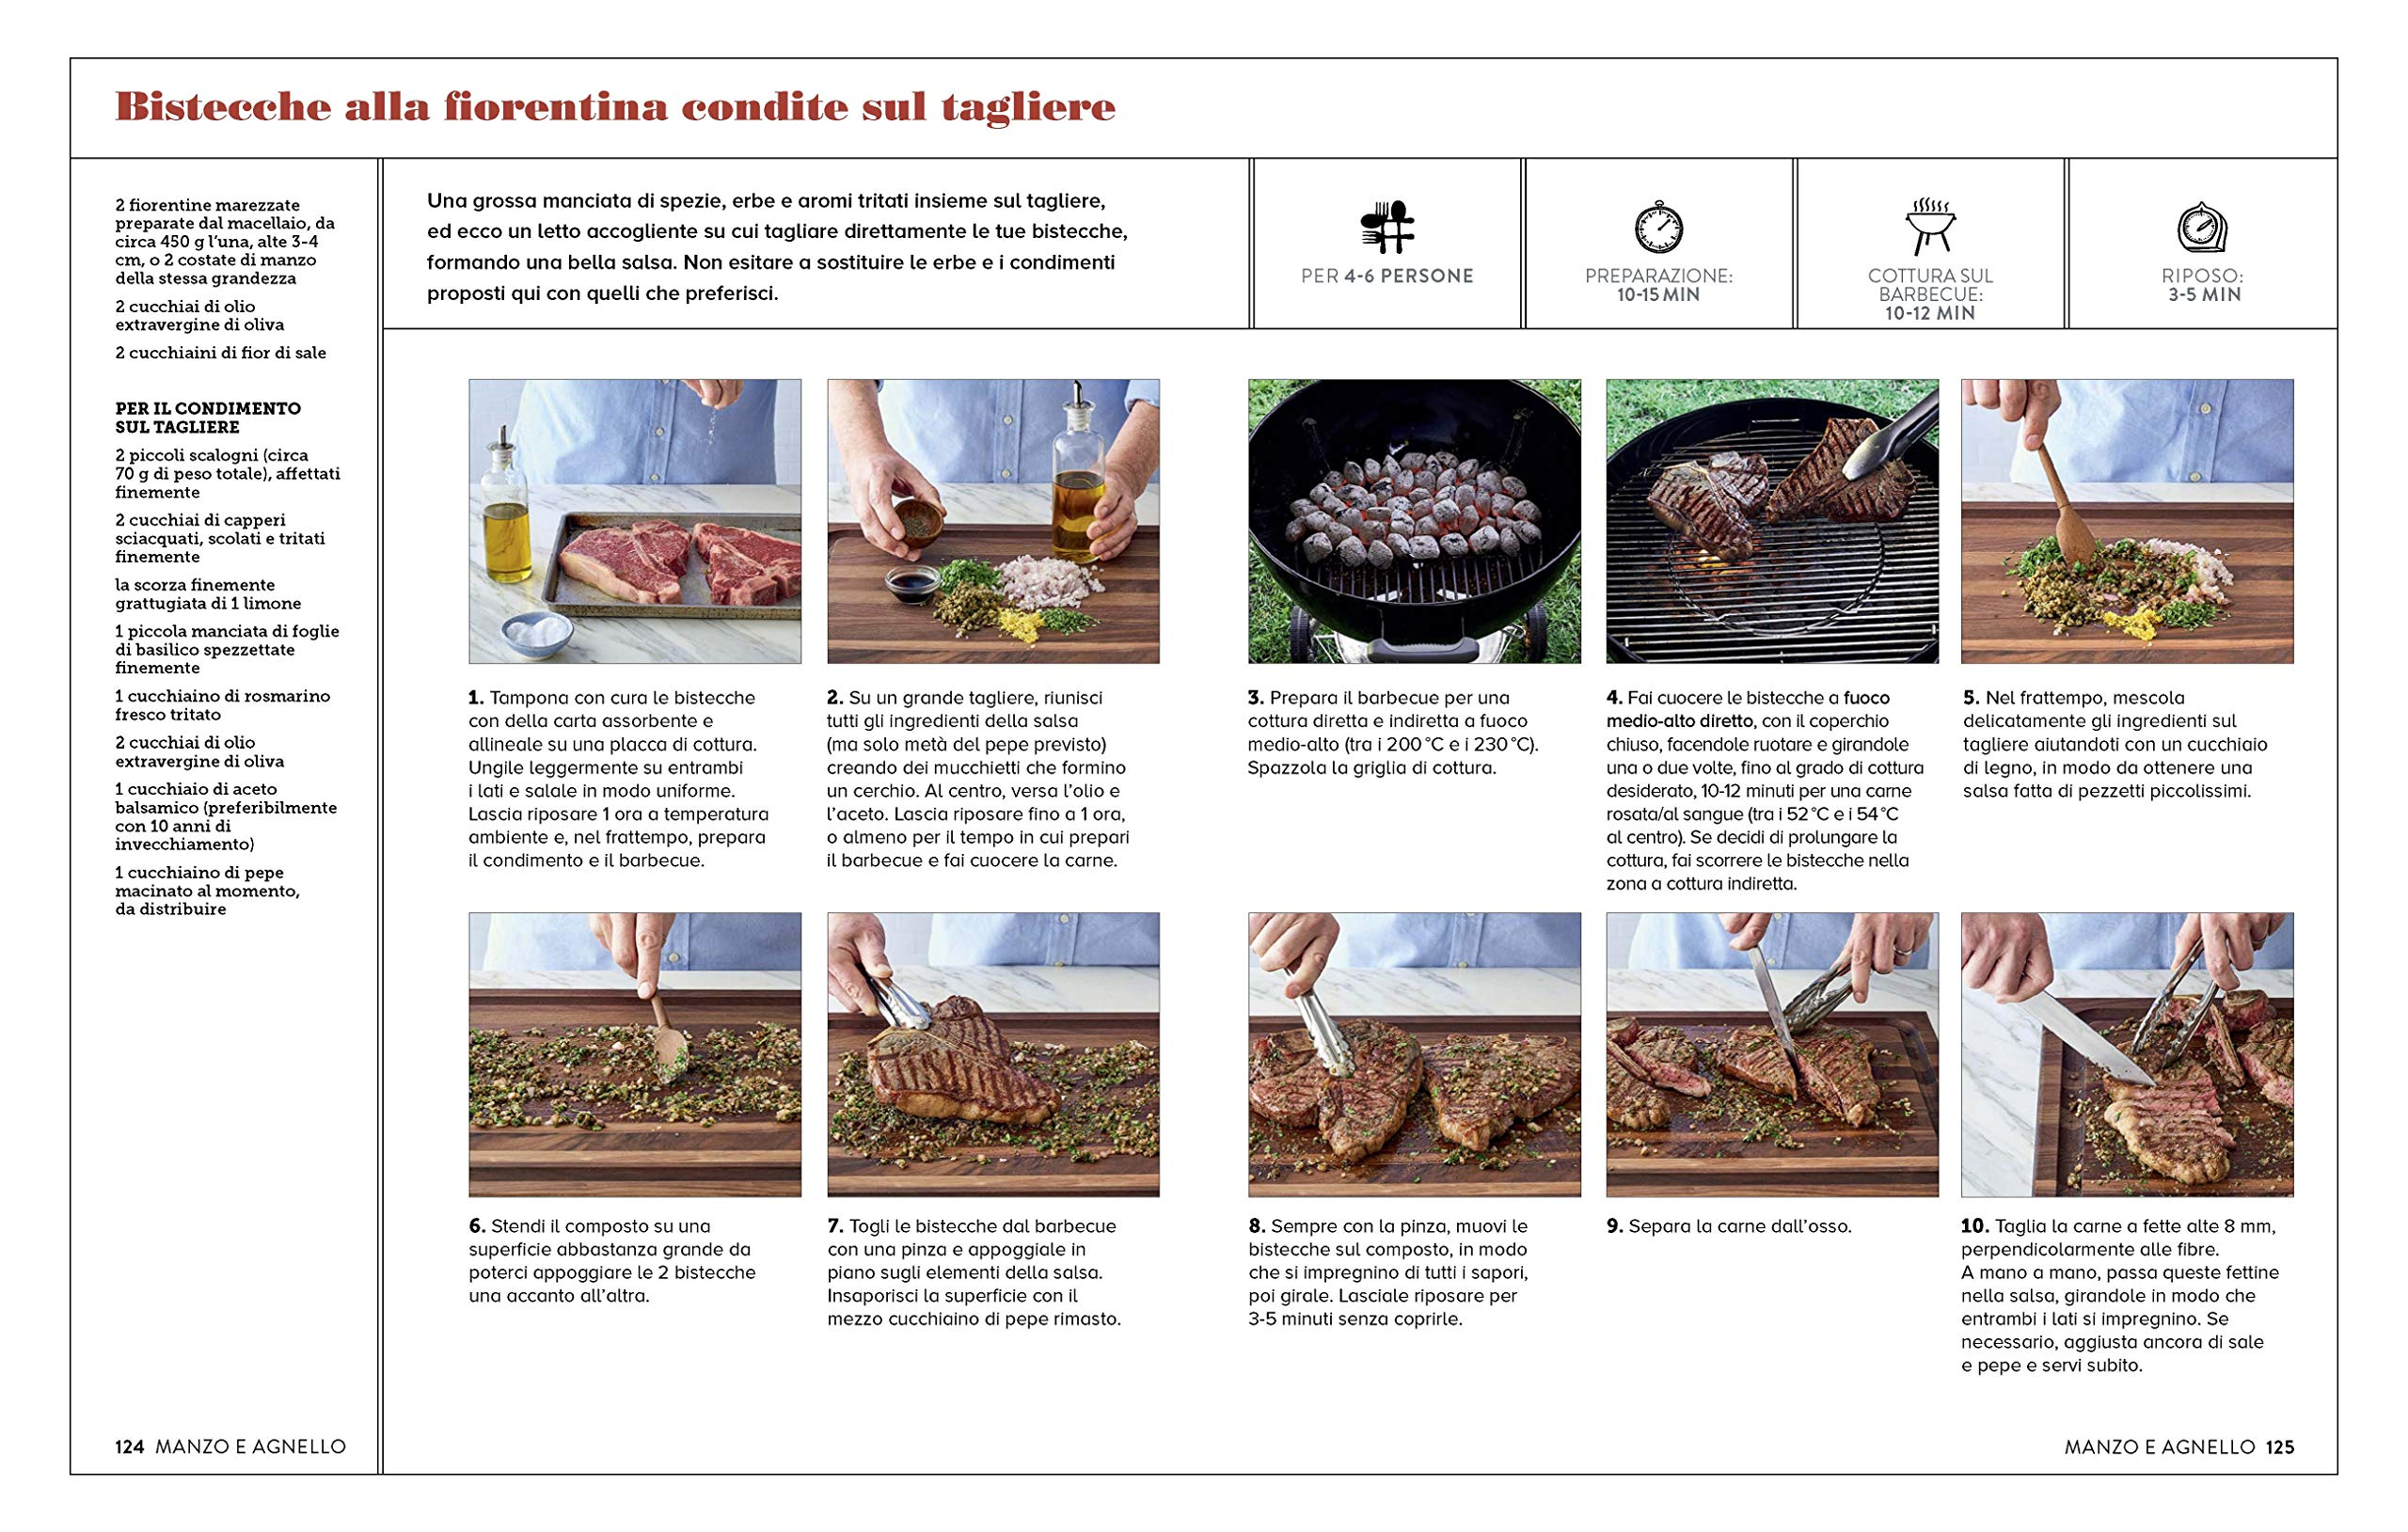 la-nuova-bibbia-del-barbecue-weber.jpg